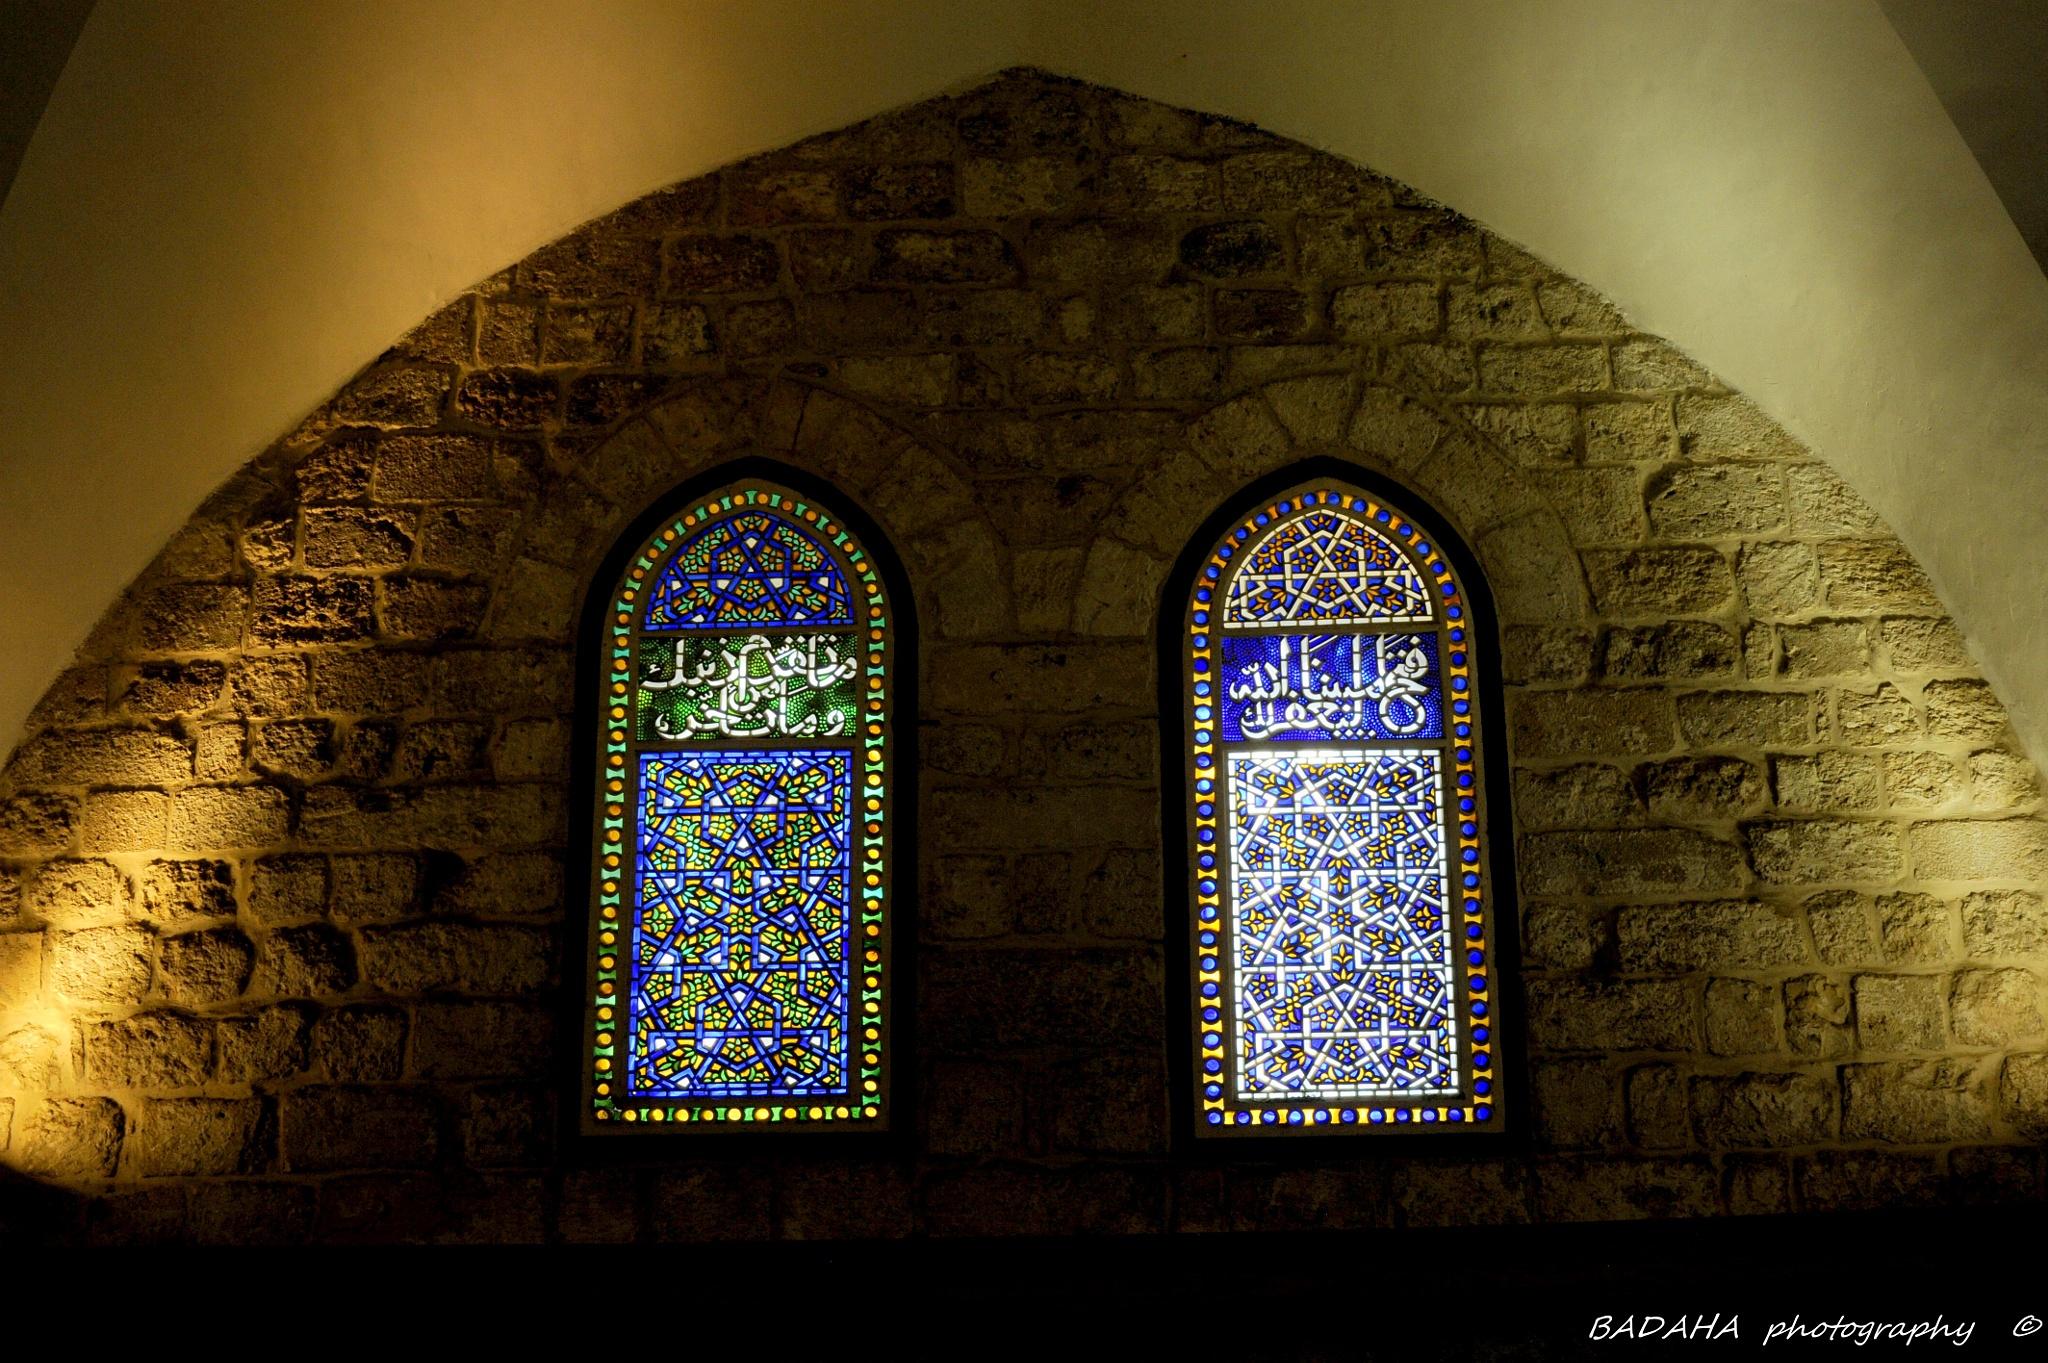 Islamic Art by Mohammad Badaha